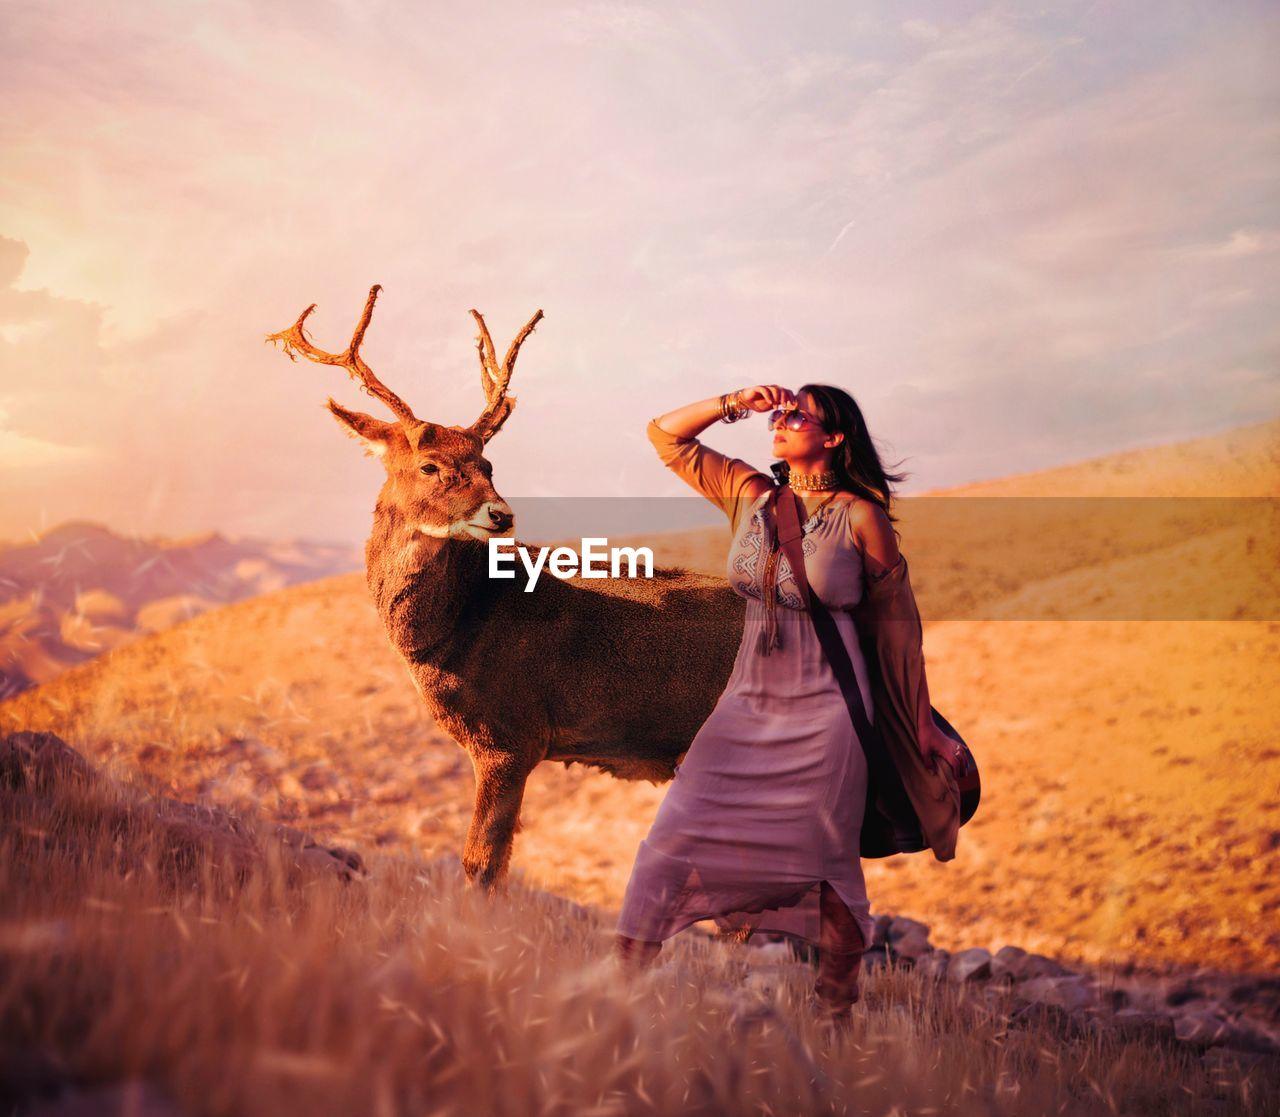 Woman standing by deer on land against sky